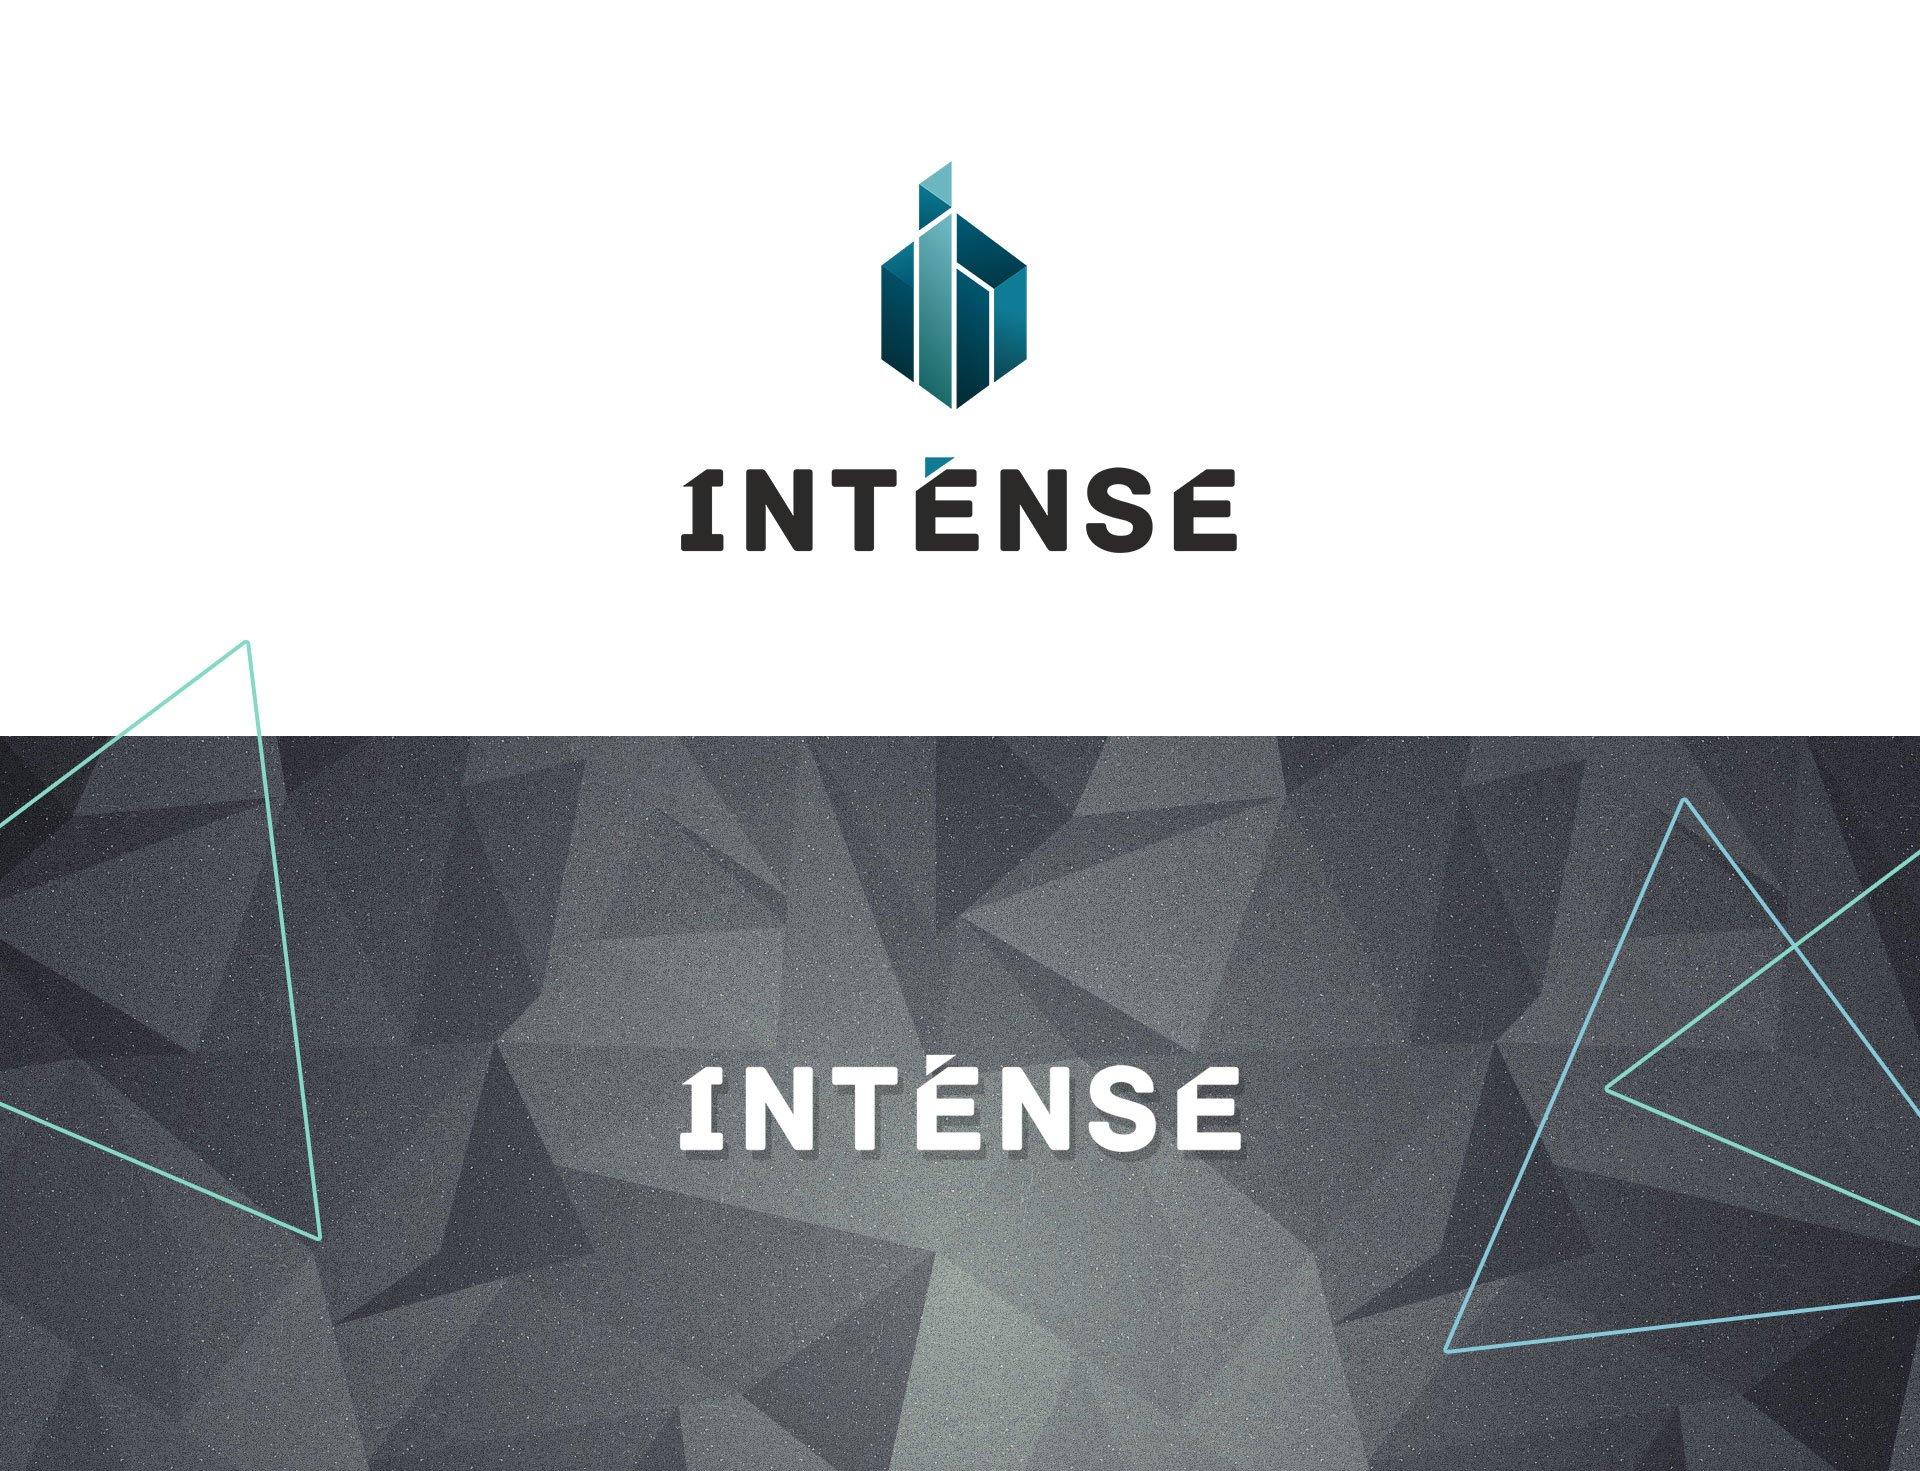 Intense-01